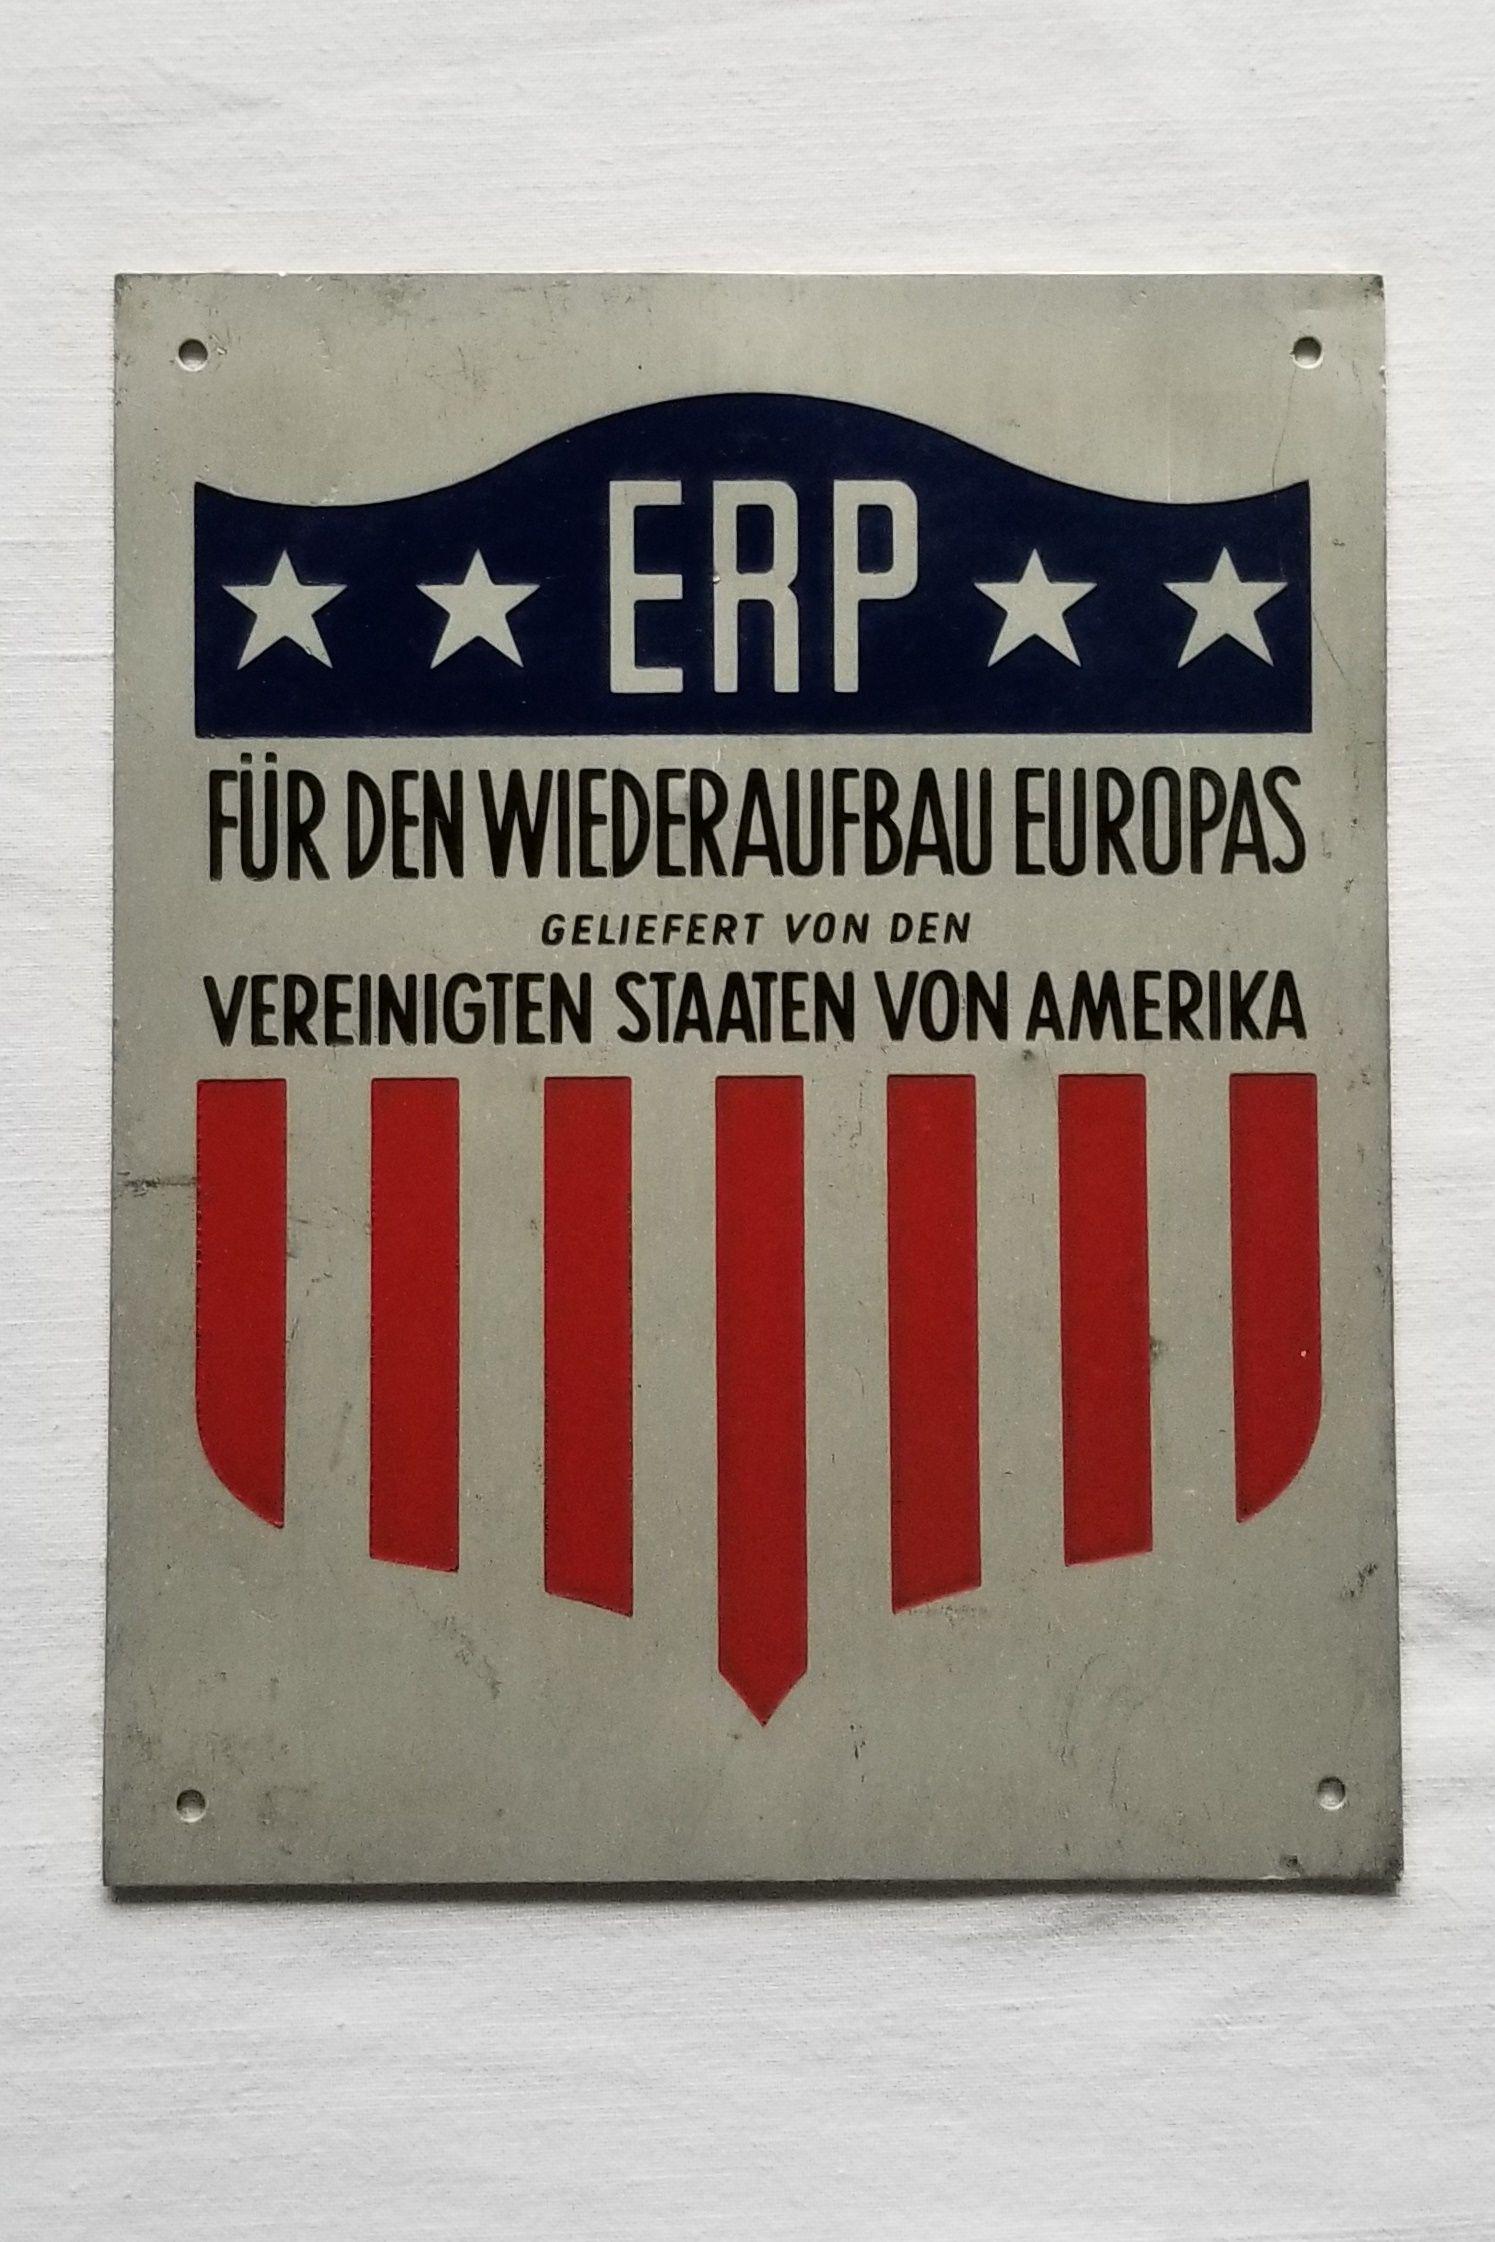 File:ERP Wiederaufbau Recovery Program zu Wiederaufbau Europas